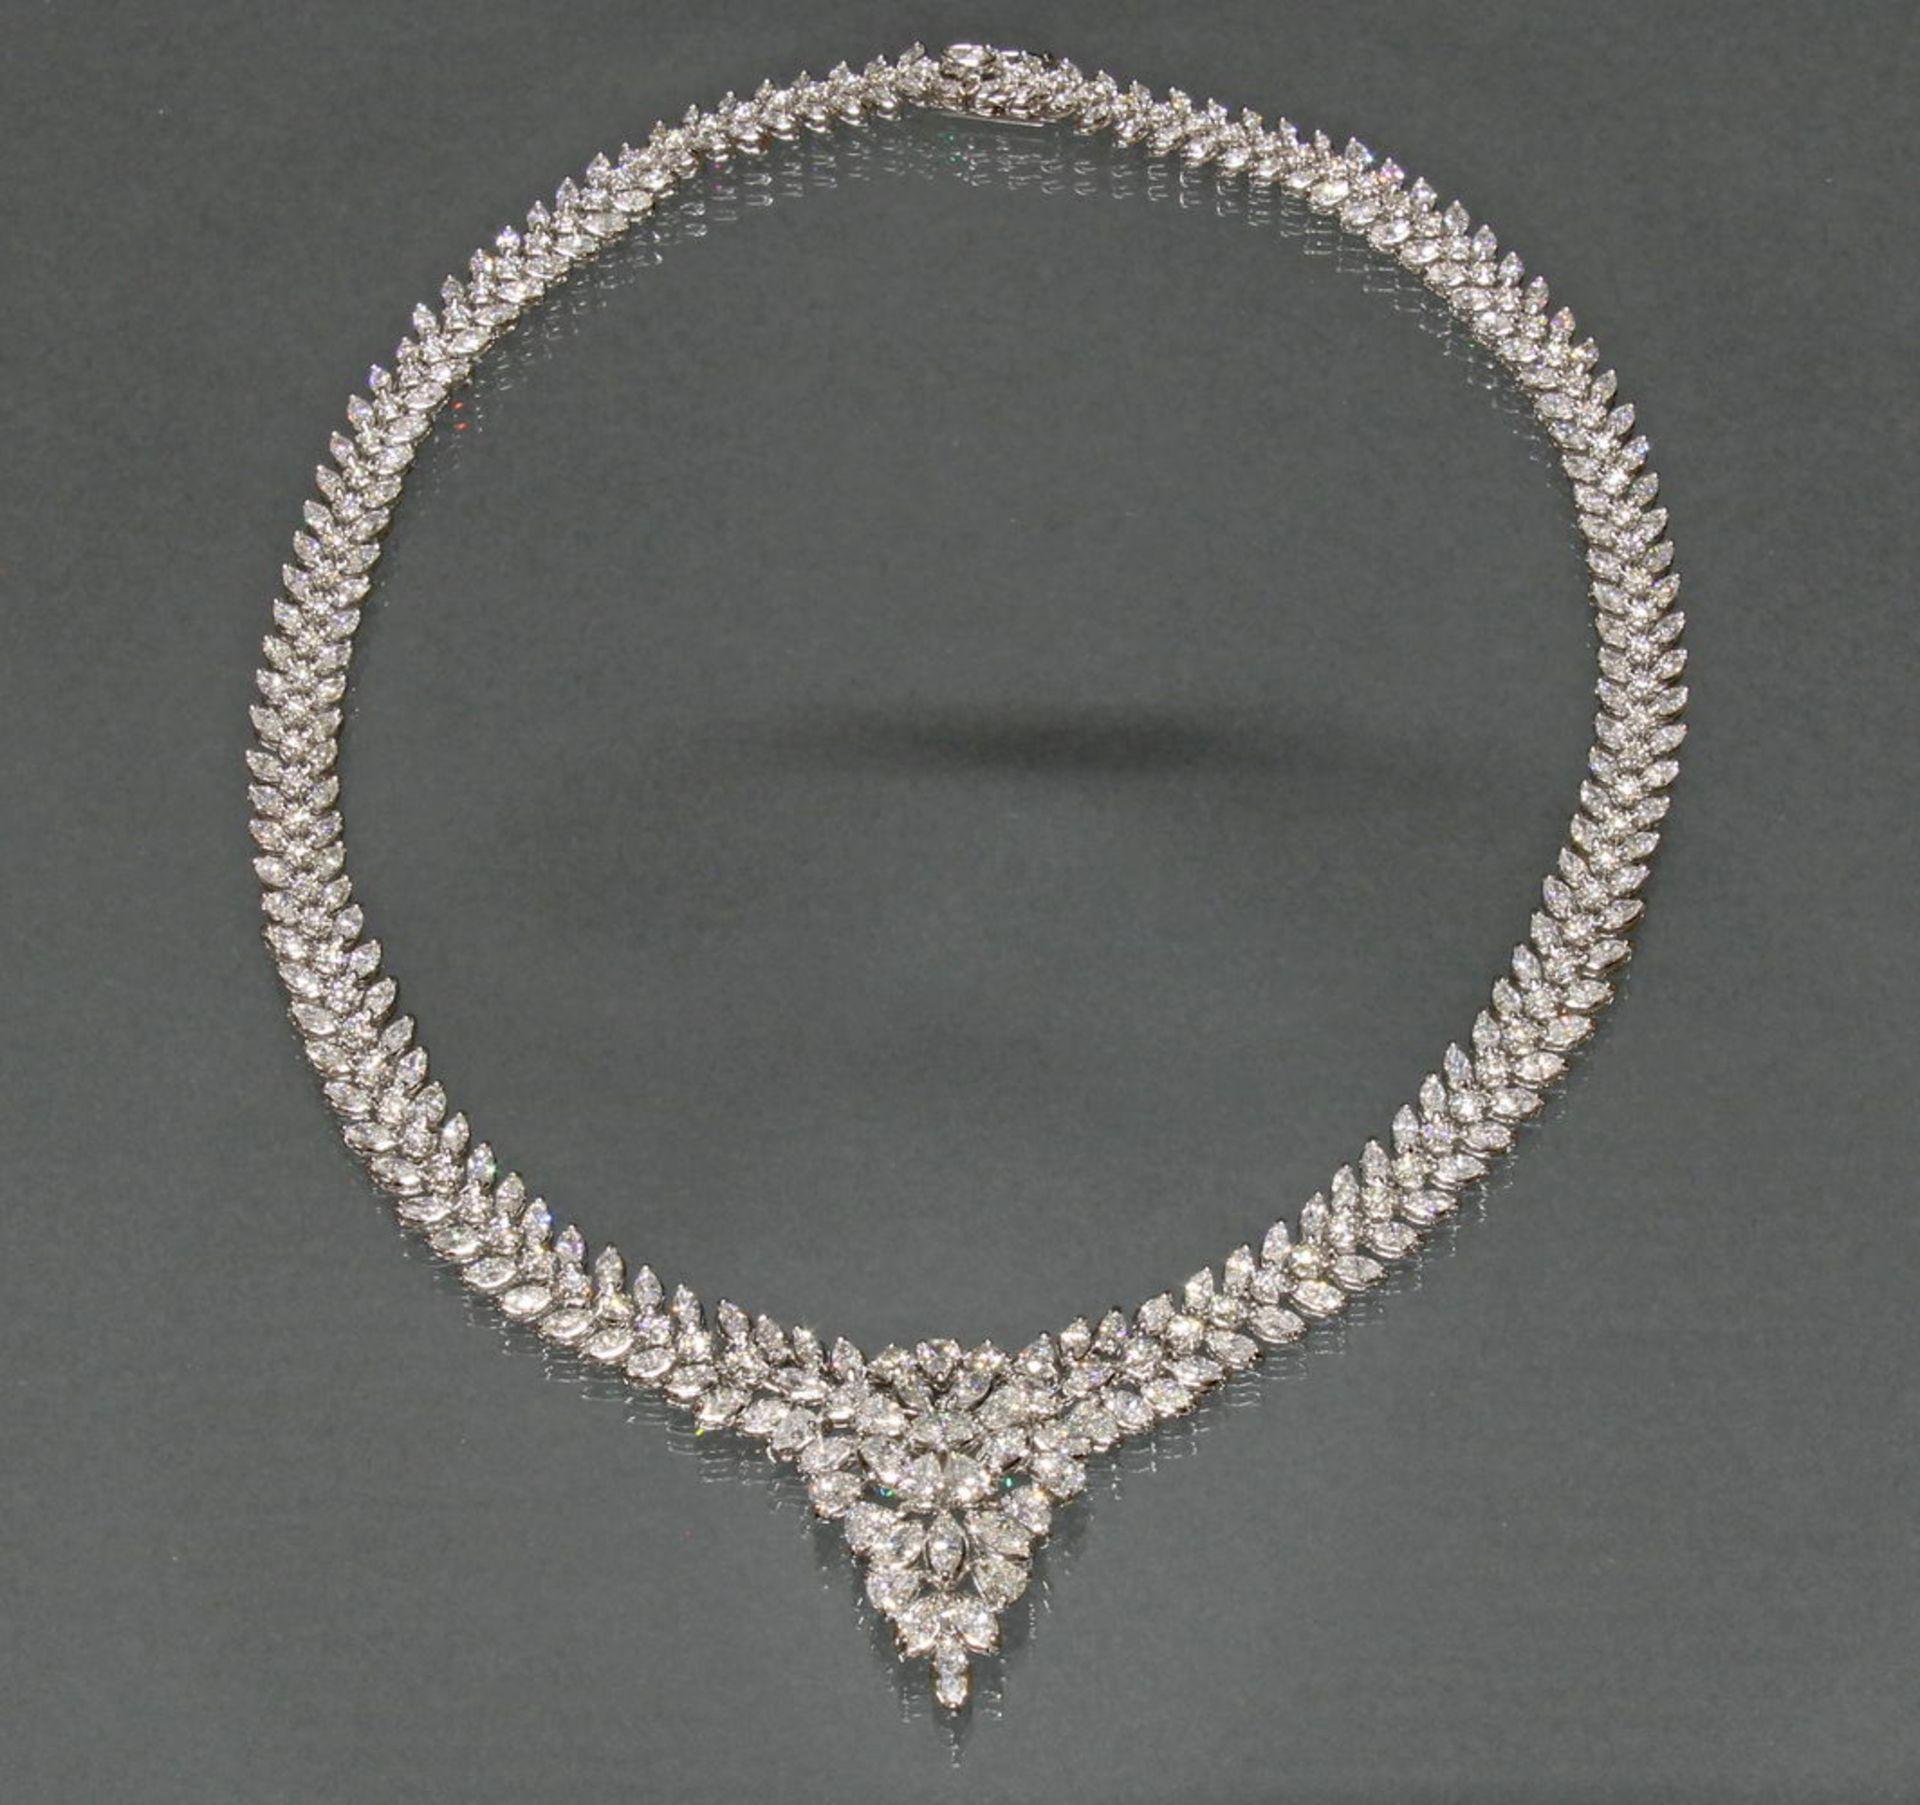 Collier, Atelier J.P. CAM, Fine Jewelery, Hongkong, WG 750, ca. 19.05 ct. - Bild 3 aus 4